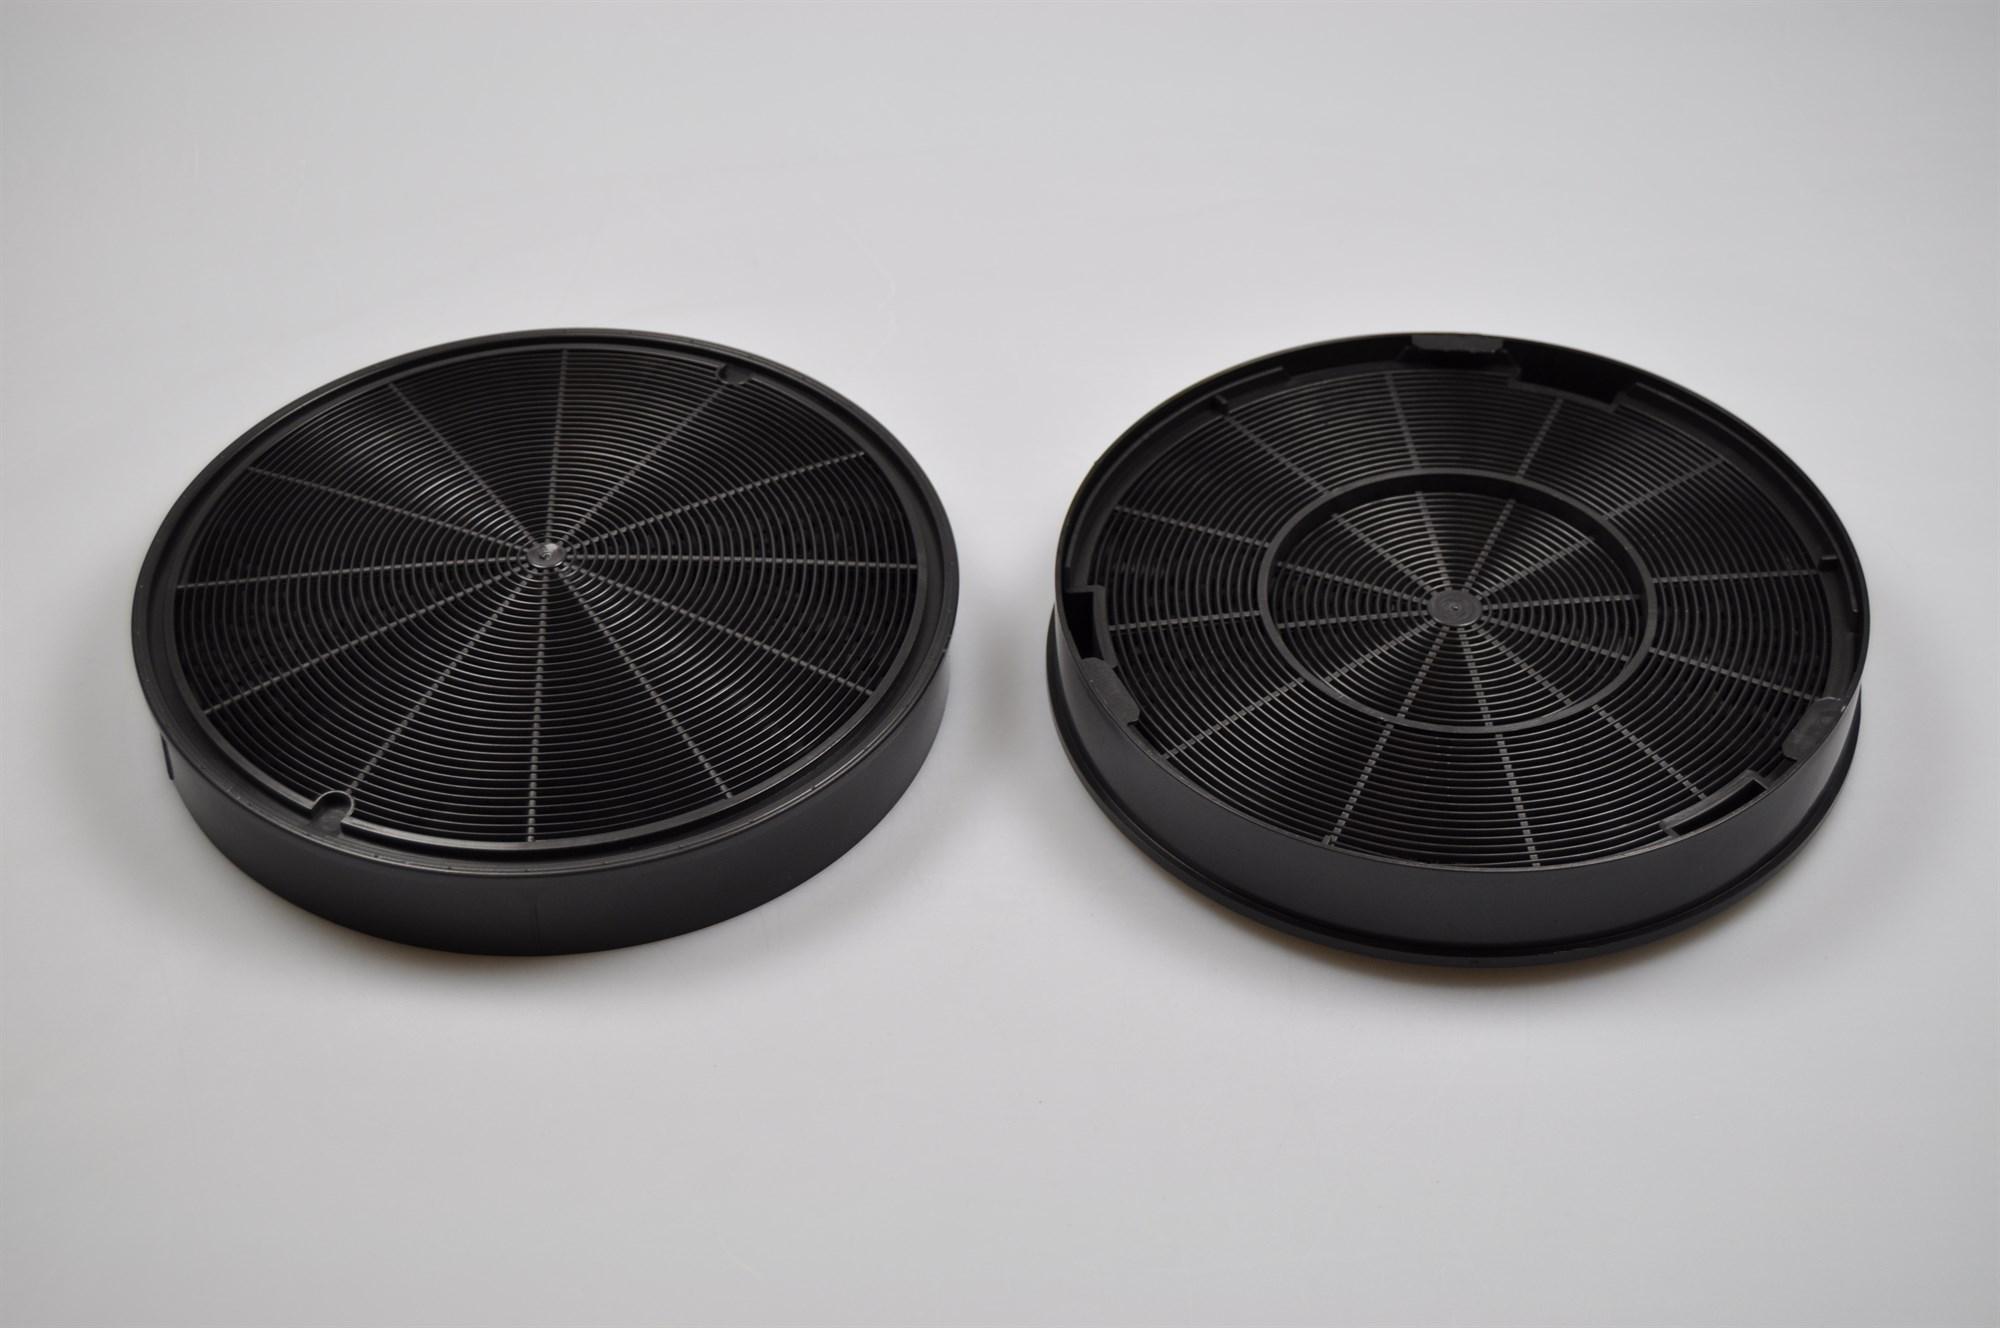 Kohlefilter juno dunstabzugshaube mm stck